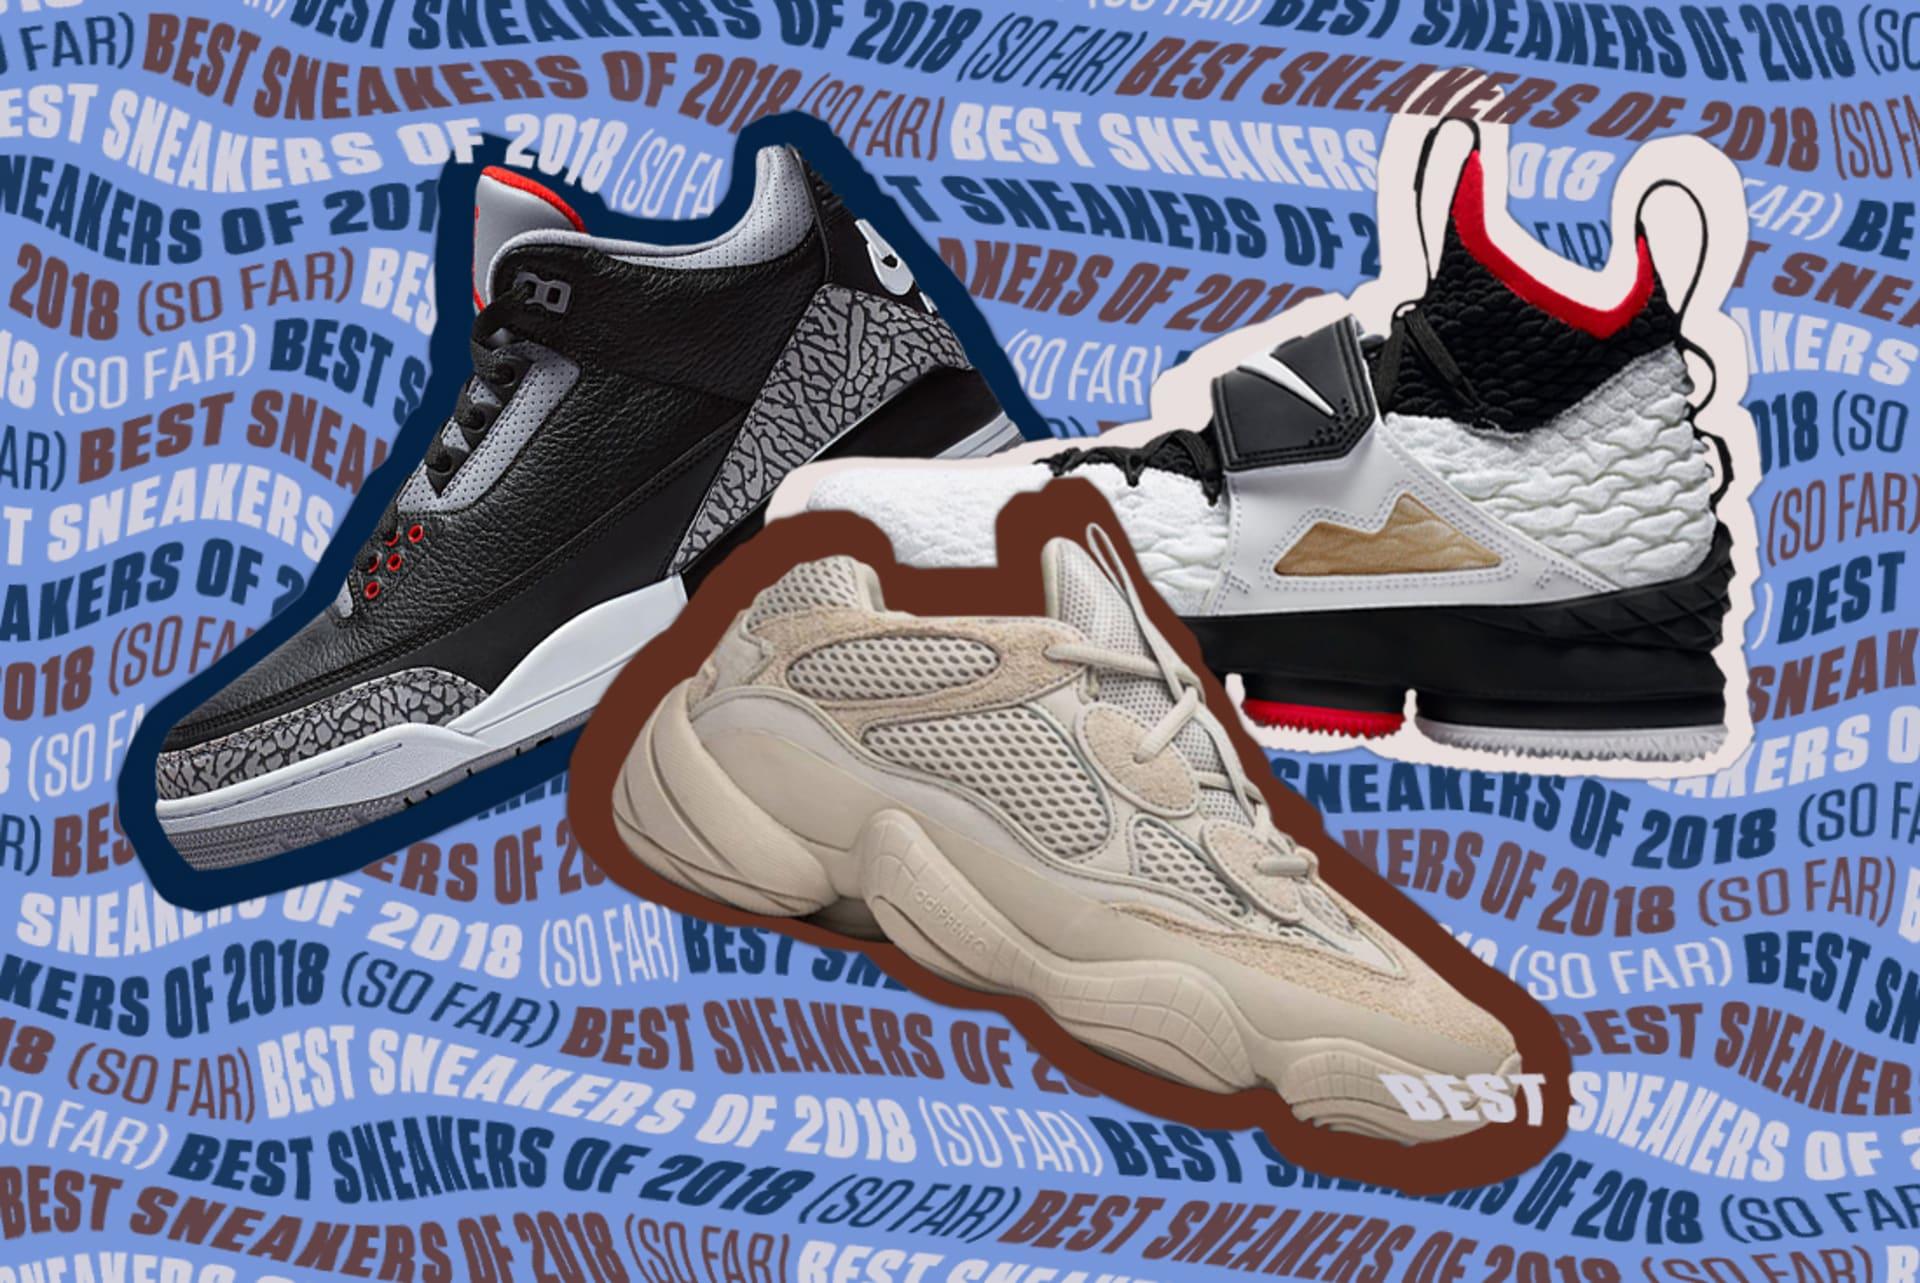 photo 8 Best Sneaker Releases Of The Week 19.08.17